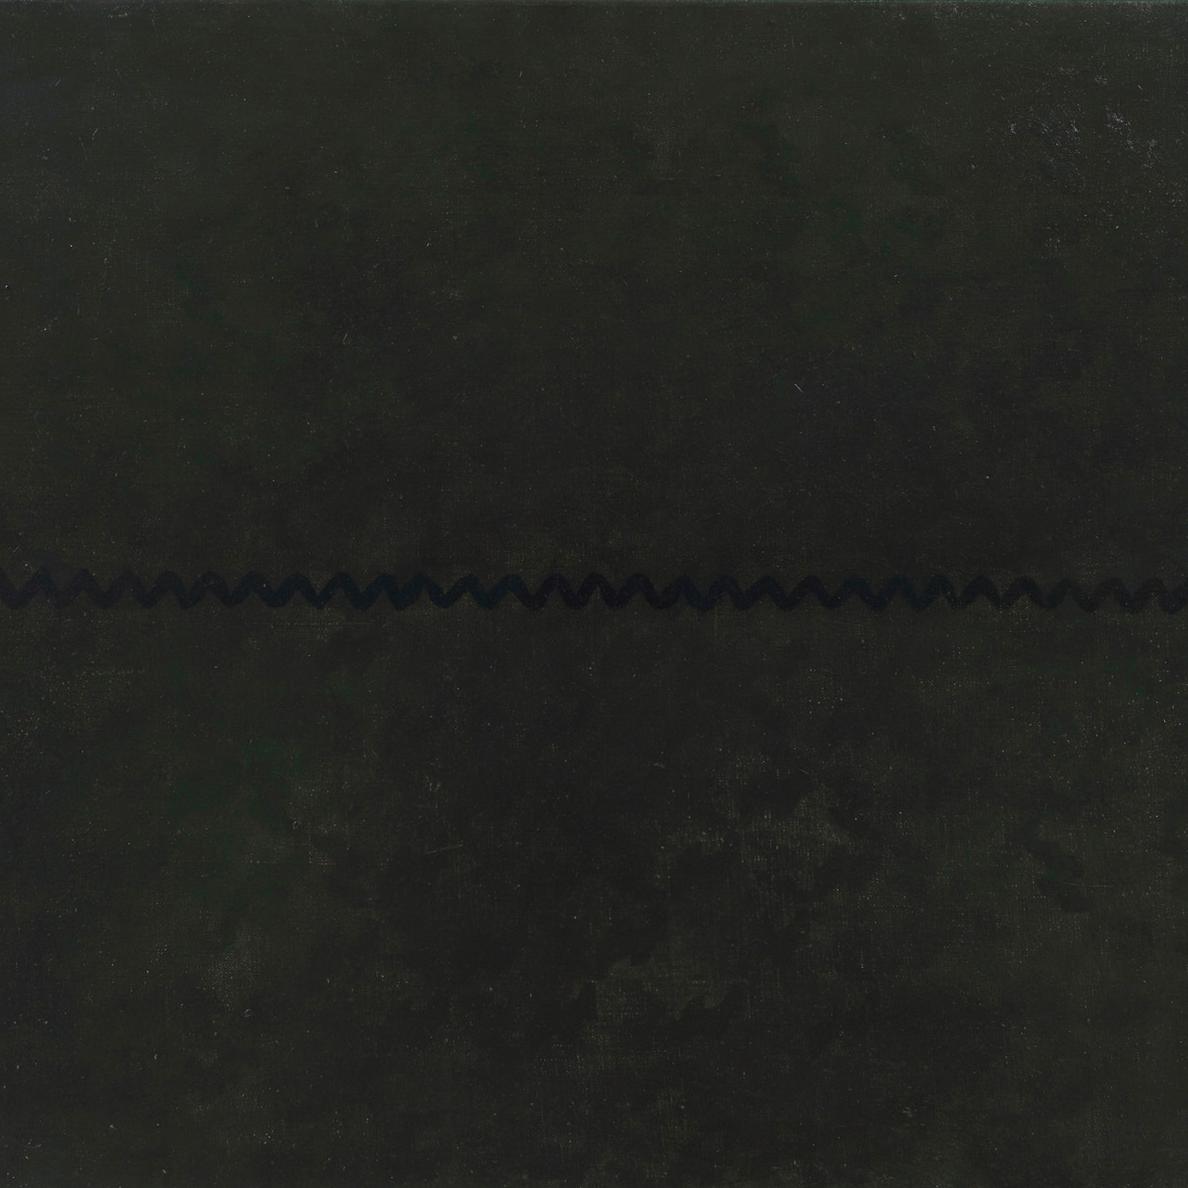 1987 - 1990